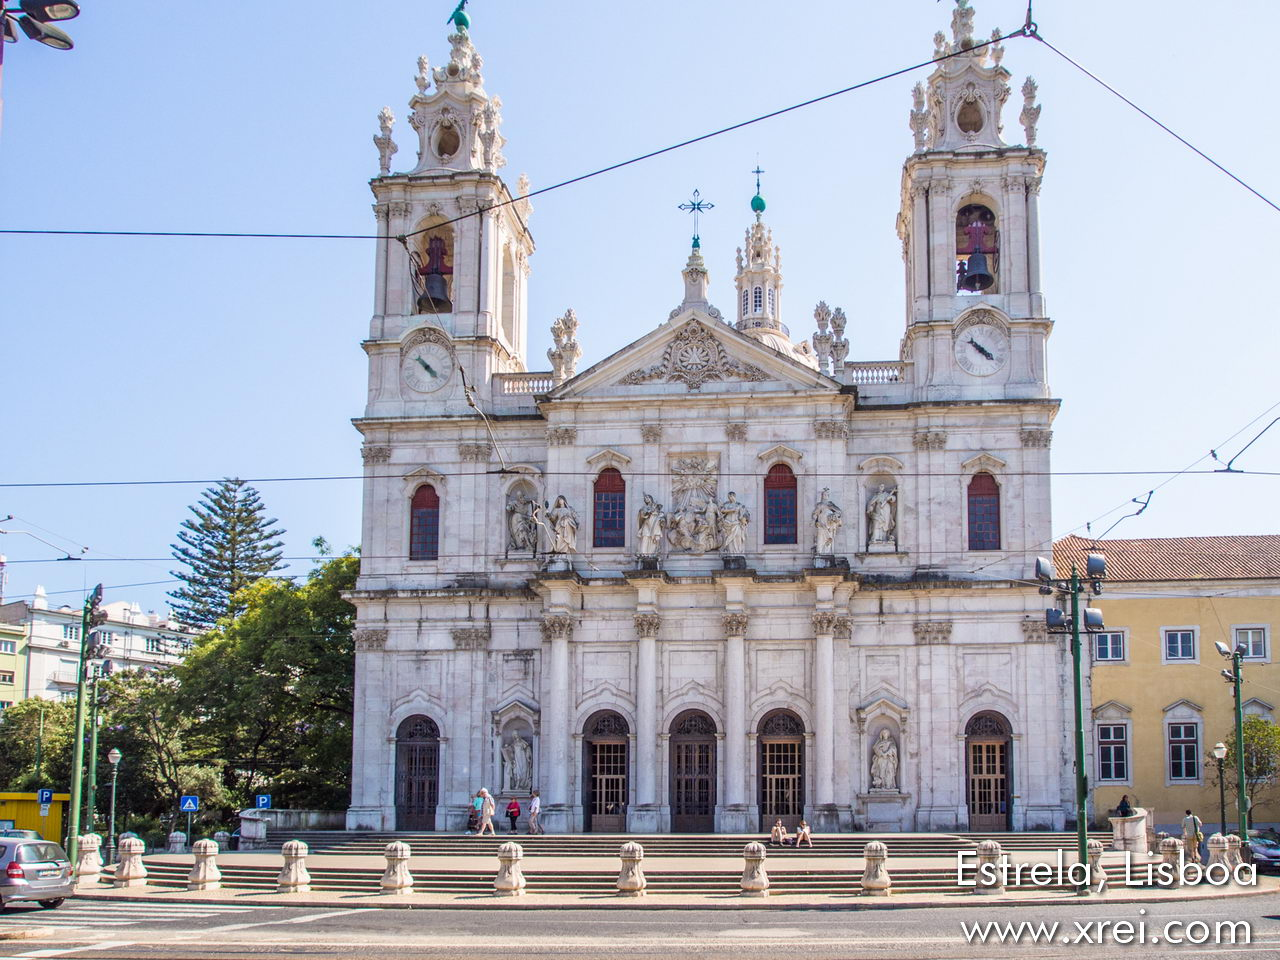 Basílica da Estrela